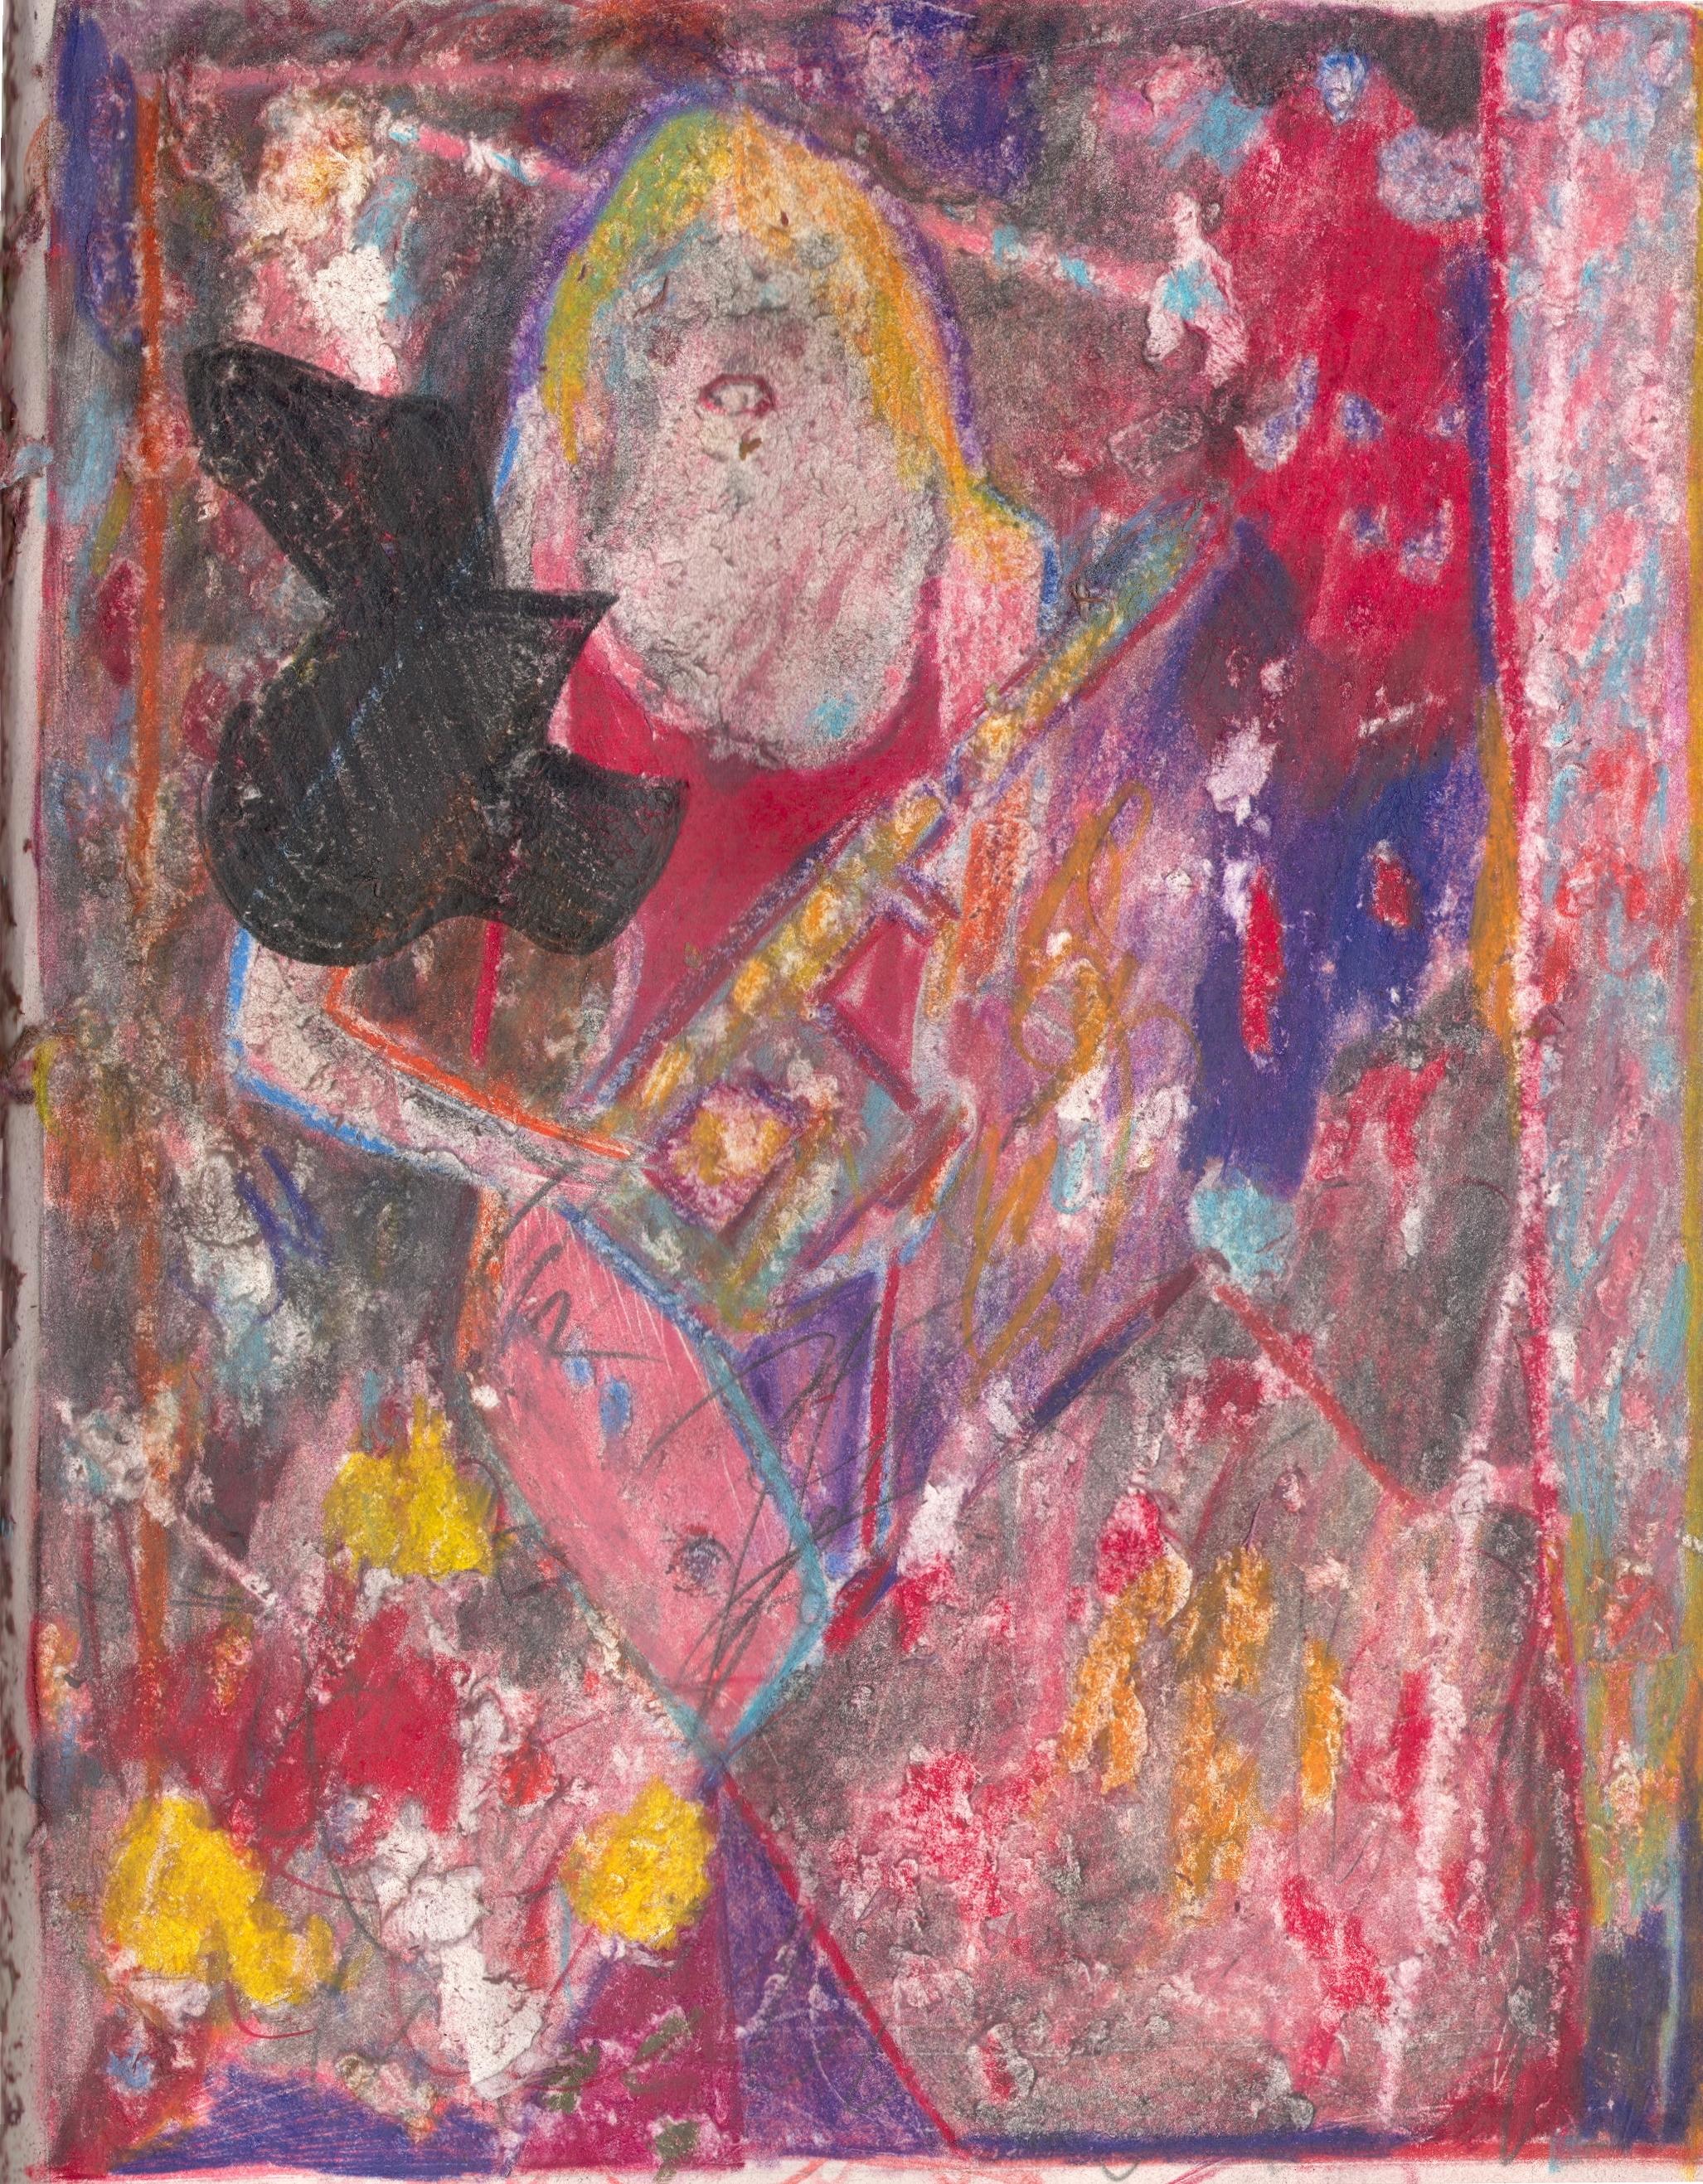 O.T. ( Pinup Makita ), 2019  Buntstift auf Papier, 26x35.5cm